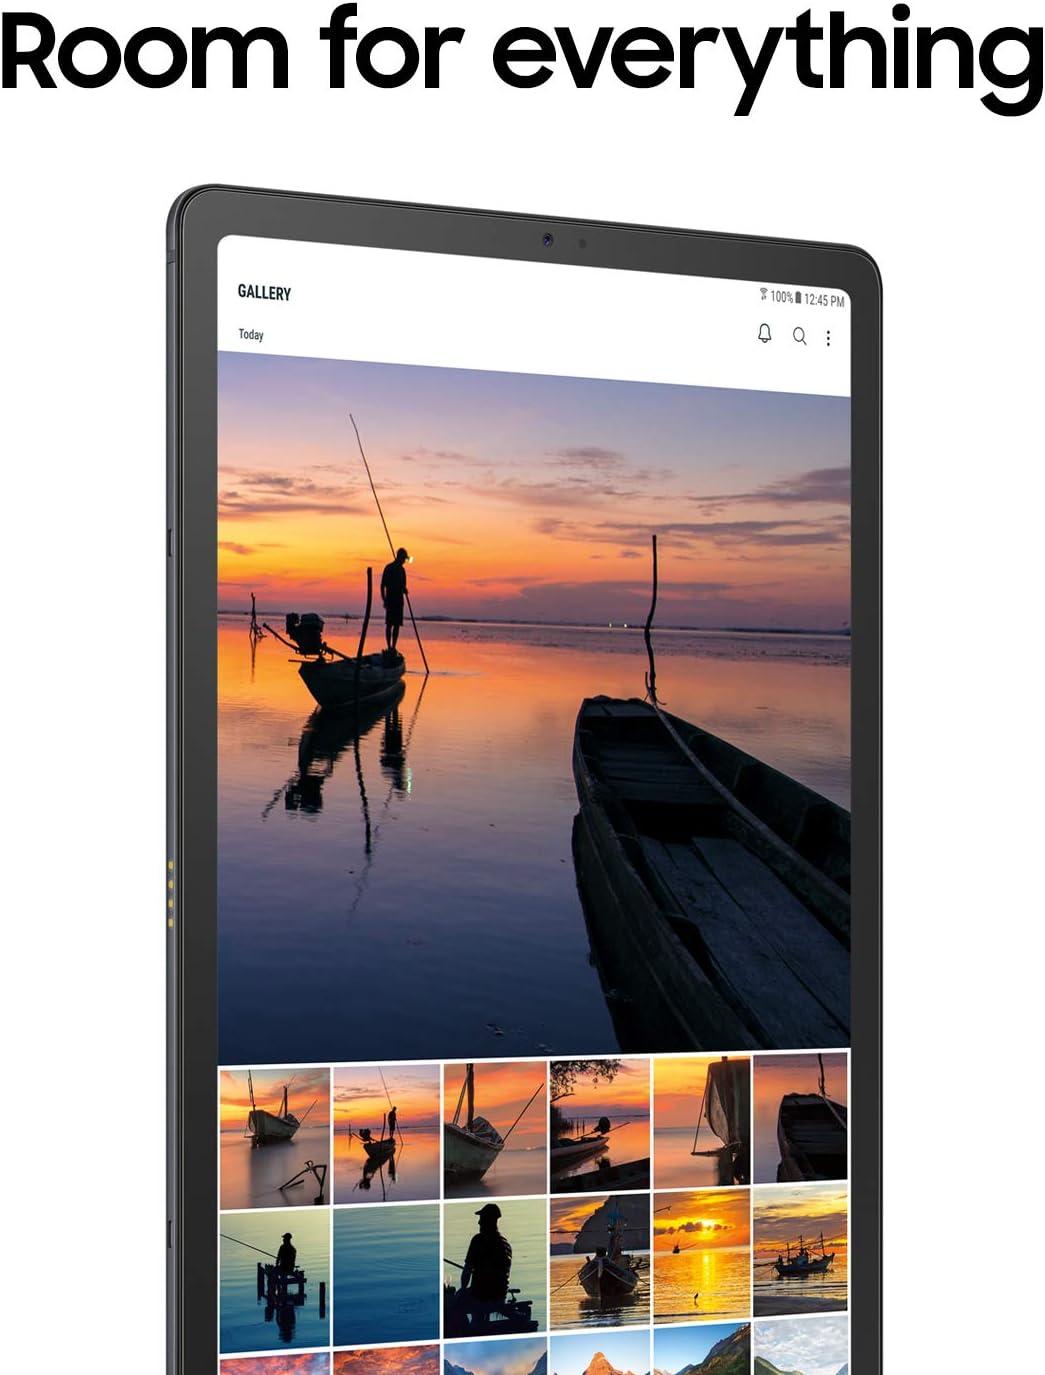 SM-T720NZSAXAR 2019 Samsung Galaxy Tab S5e 64 GB WiFi Tablet Silver